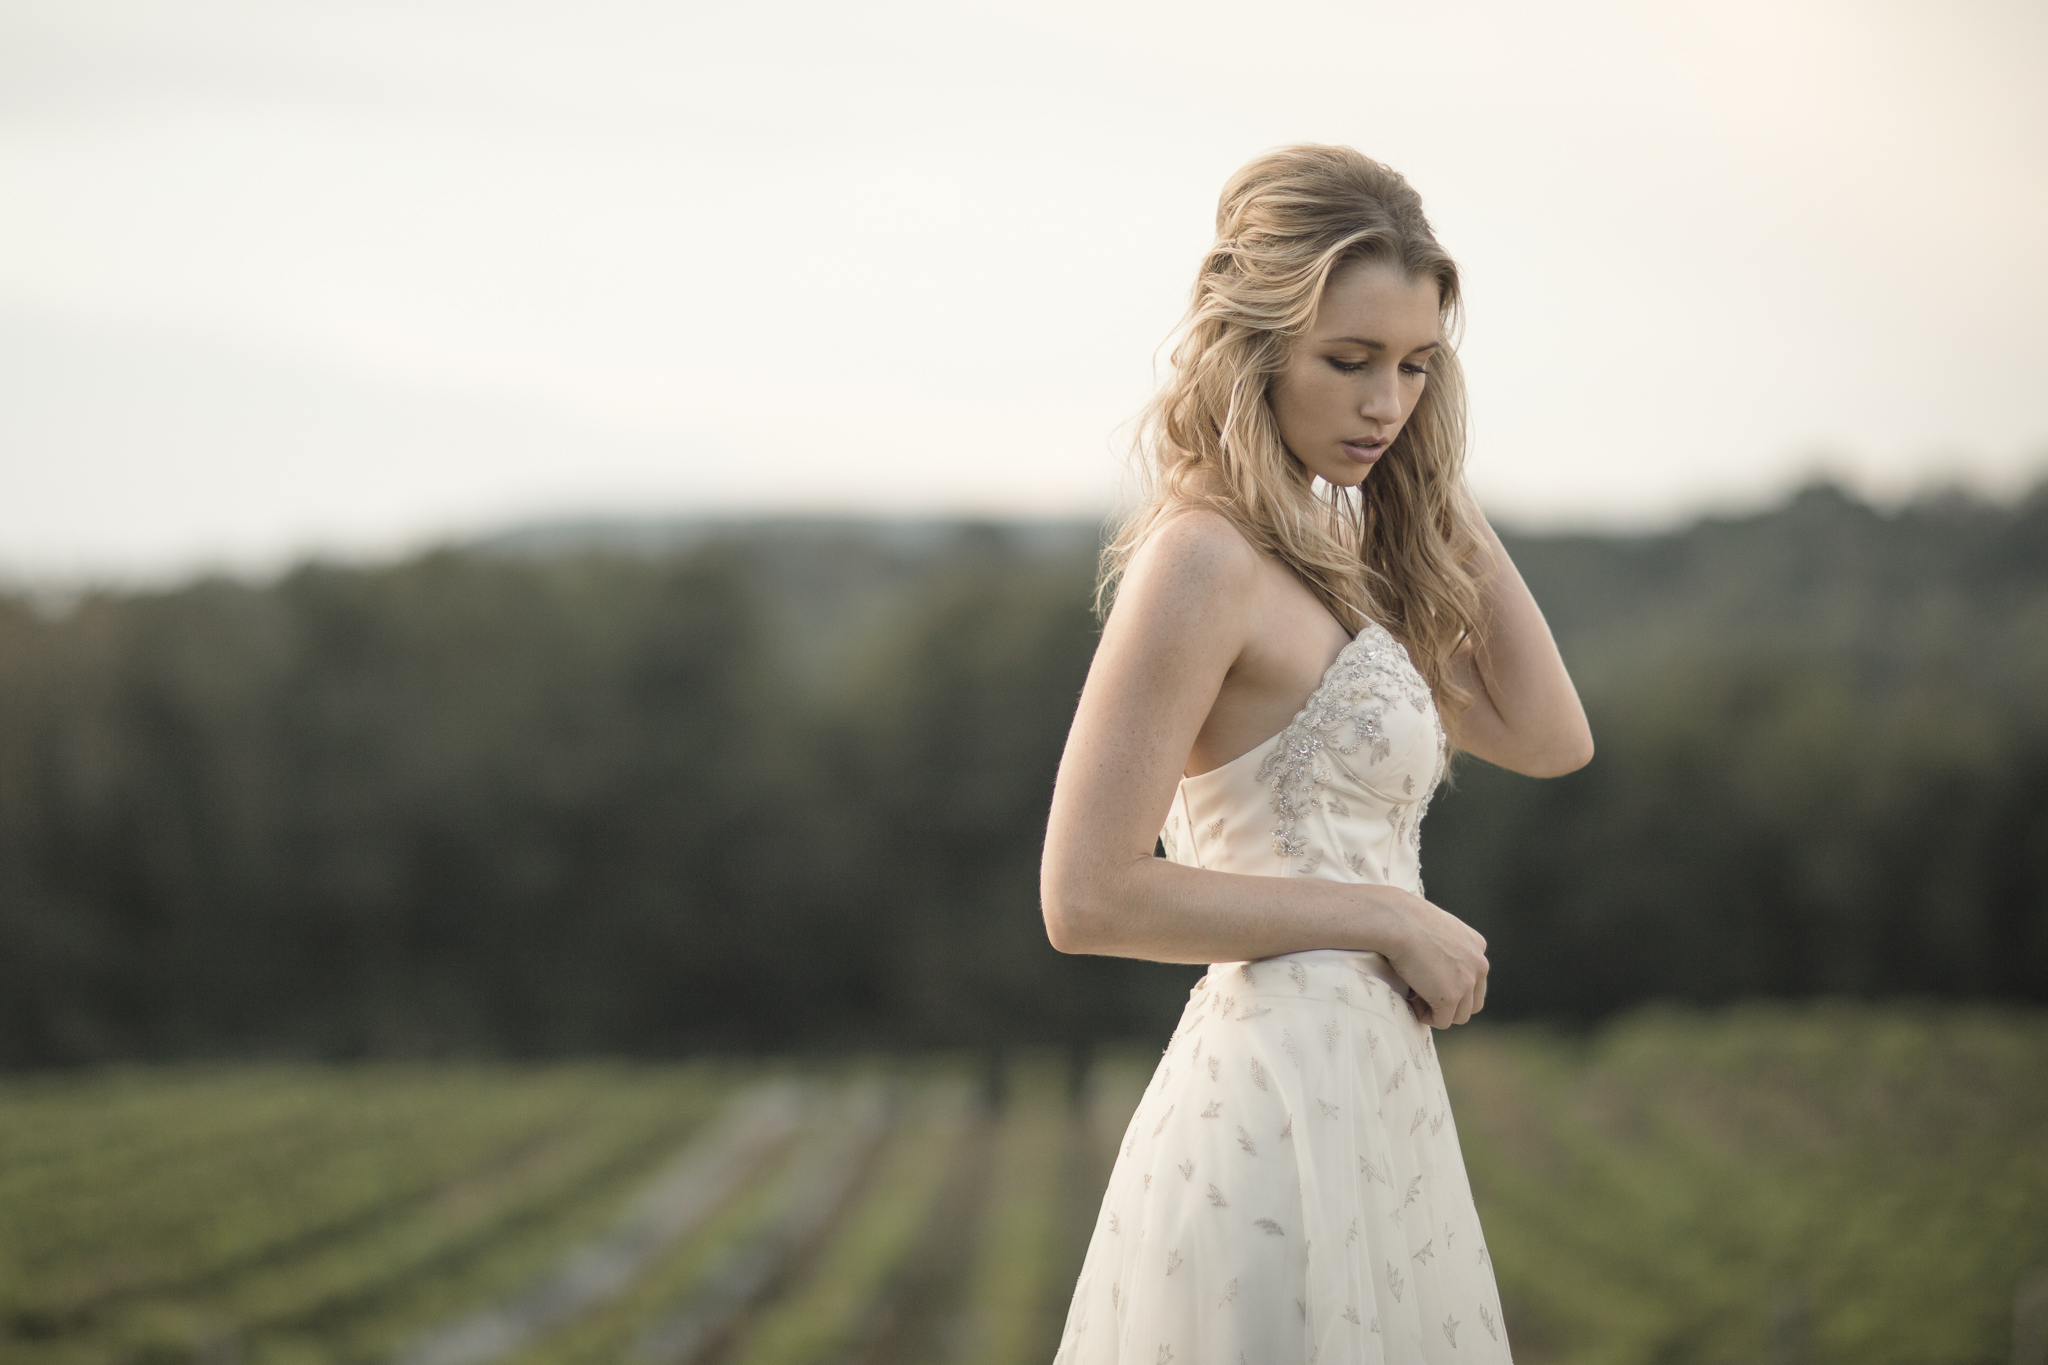 Iron_Oak_Studios_Brook-Hollow-Bride-Portrait.jpg